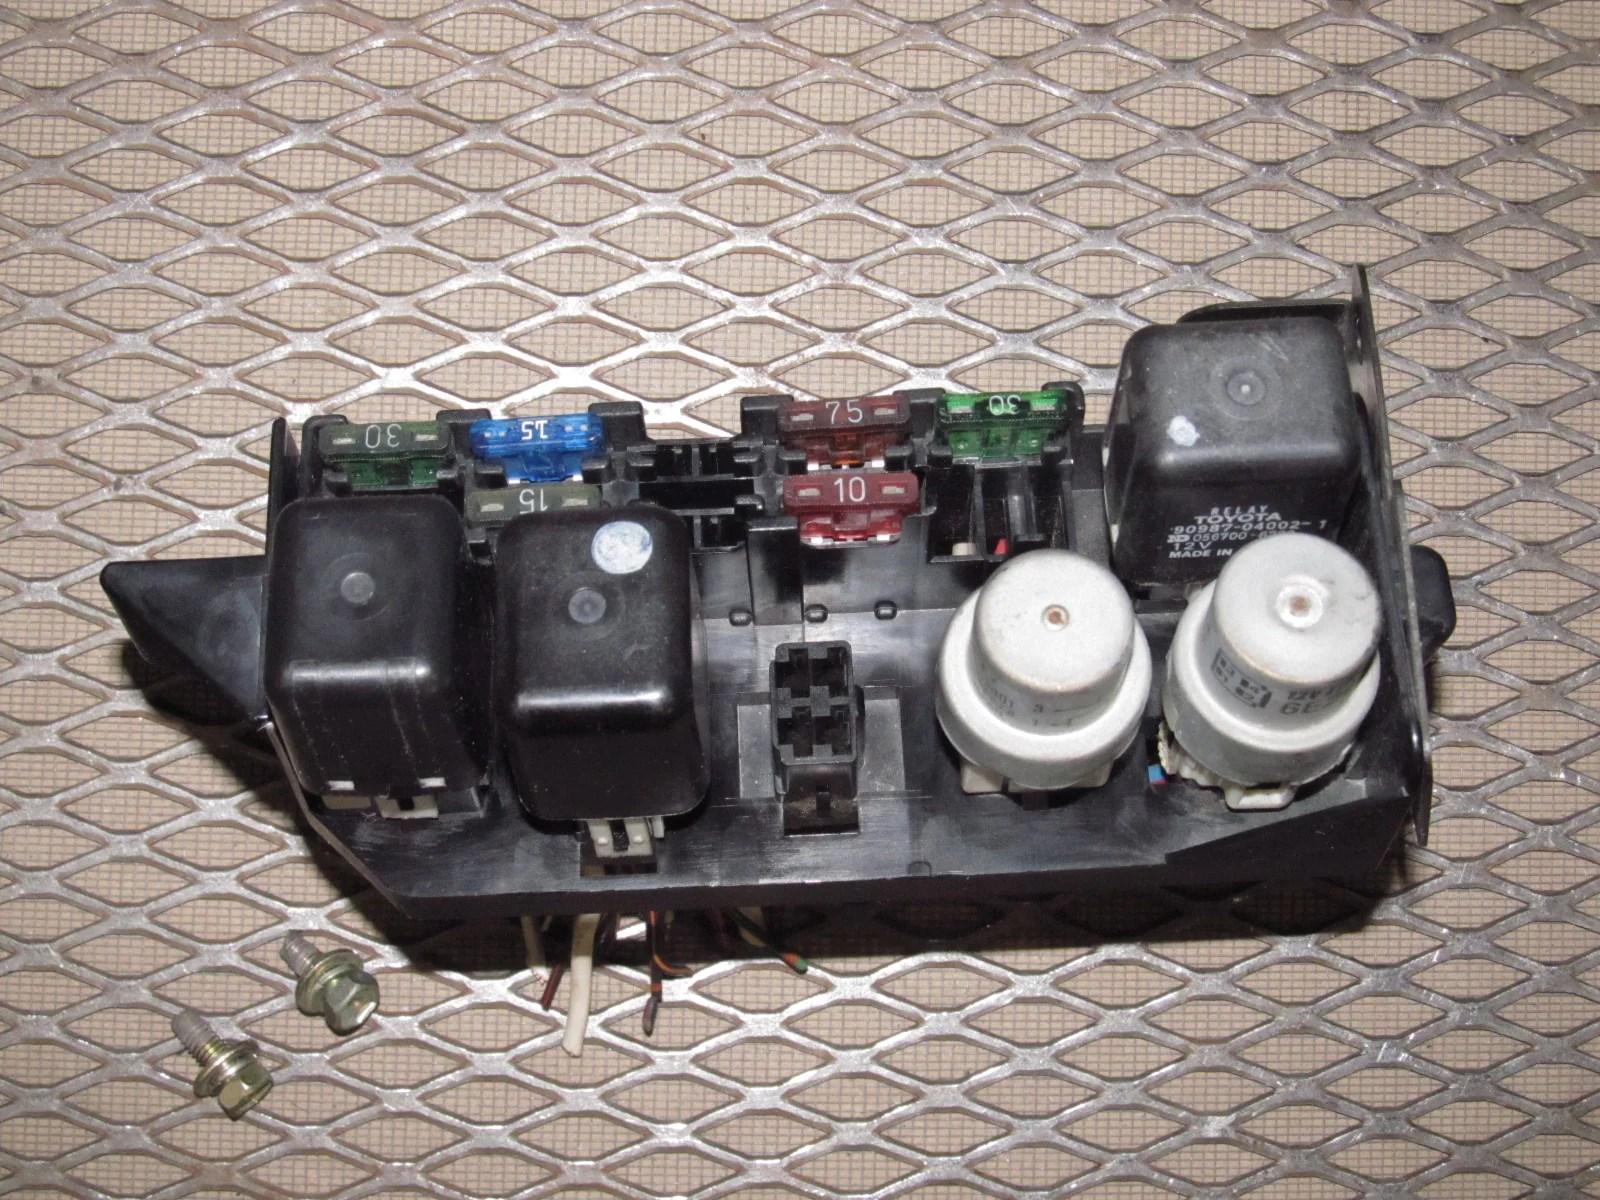 hight resolution of toyota mr2 mk1 fuse box wiring diagram centremr2 fuse box wiring diagram g985 mr2 fuse box